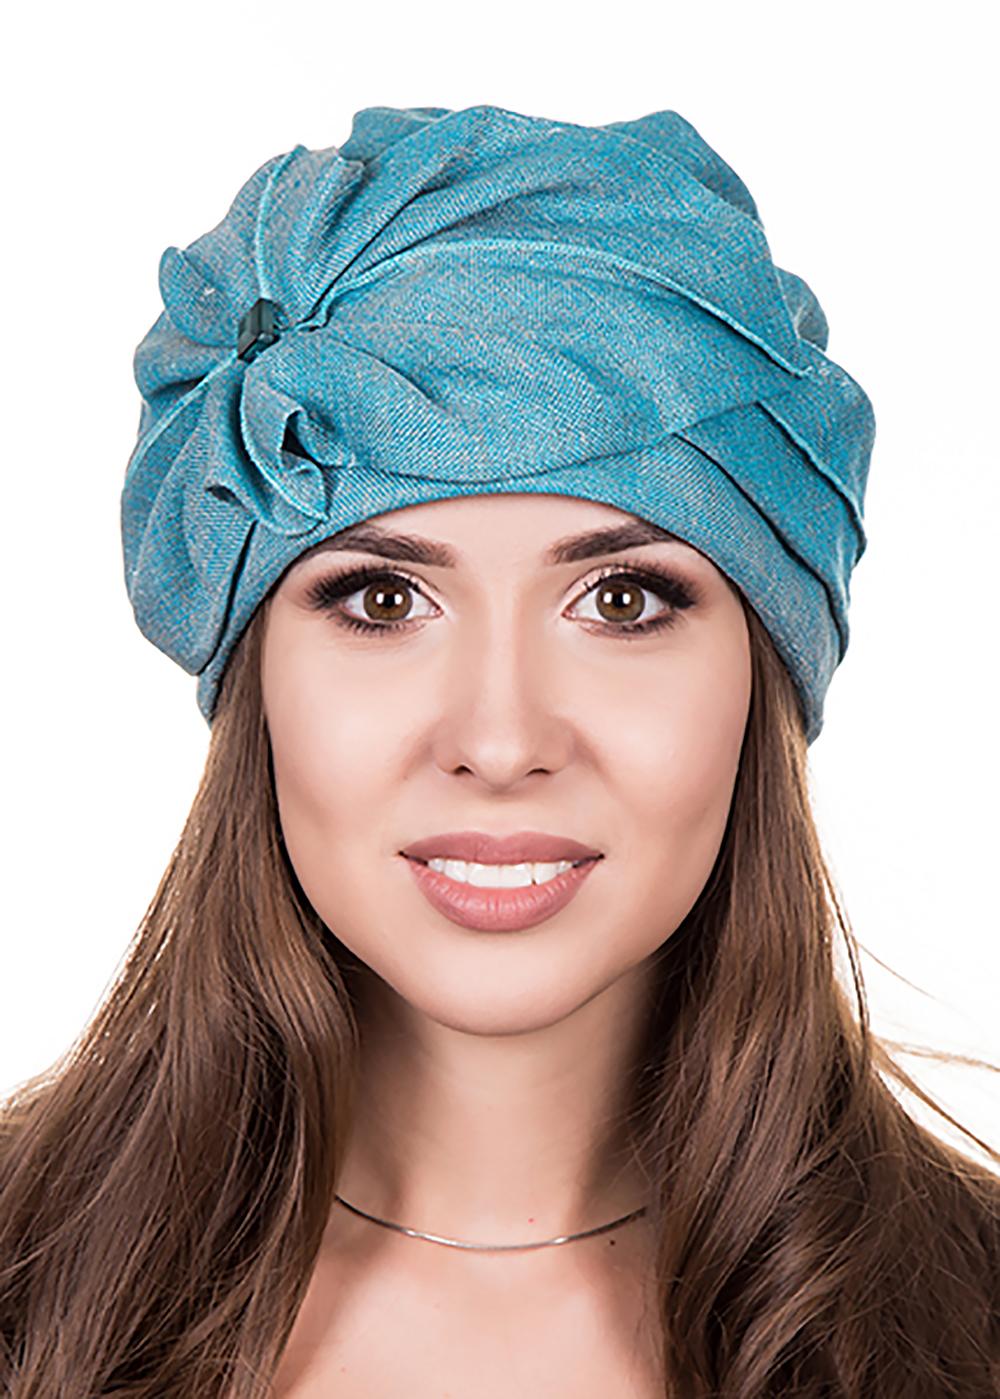 Шапка Level Pro шапка женская level pro павлина цвет серо голубой 412361 размер 56 58